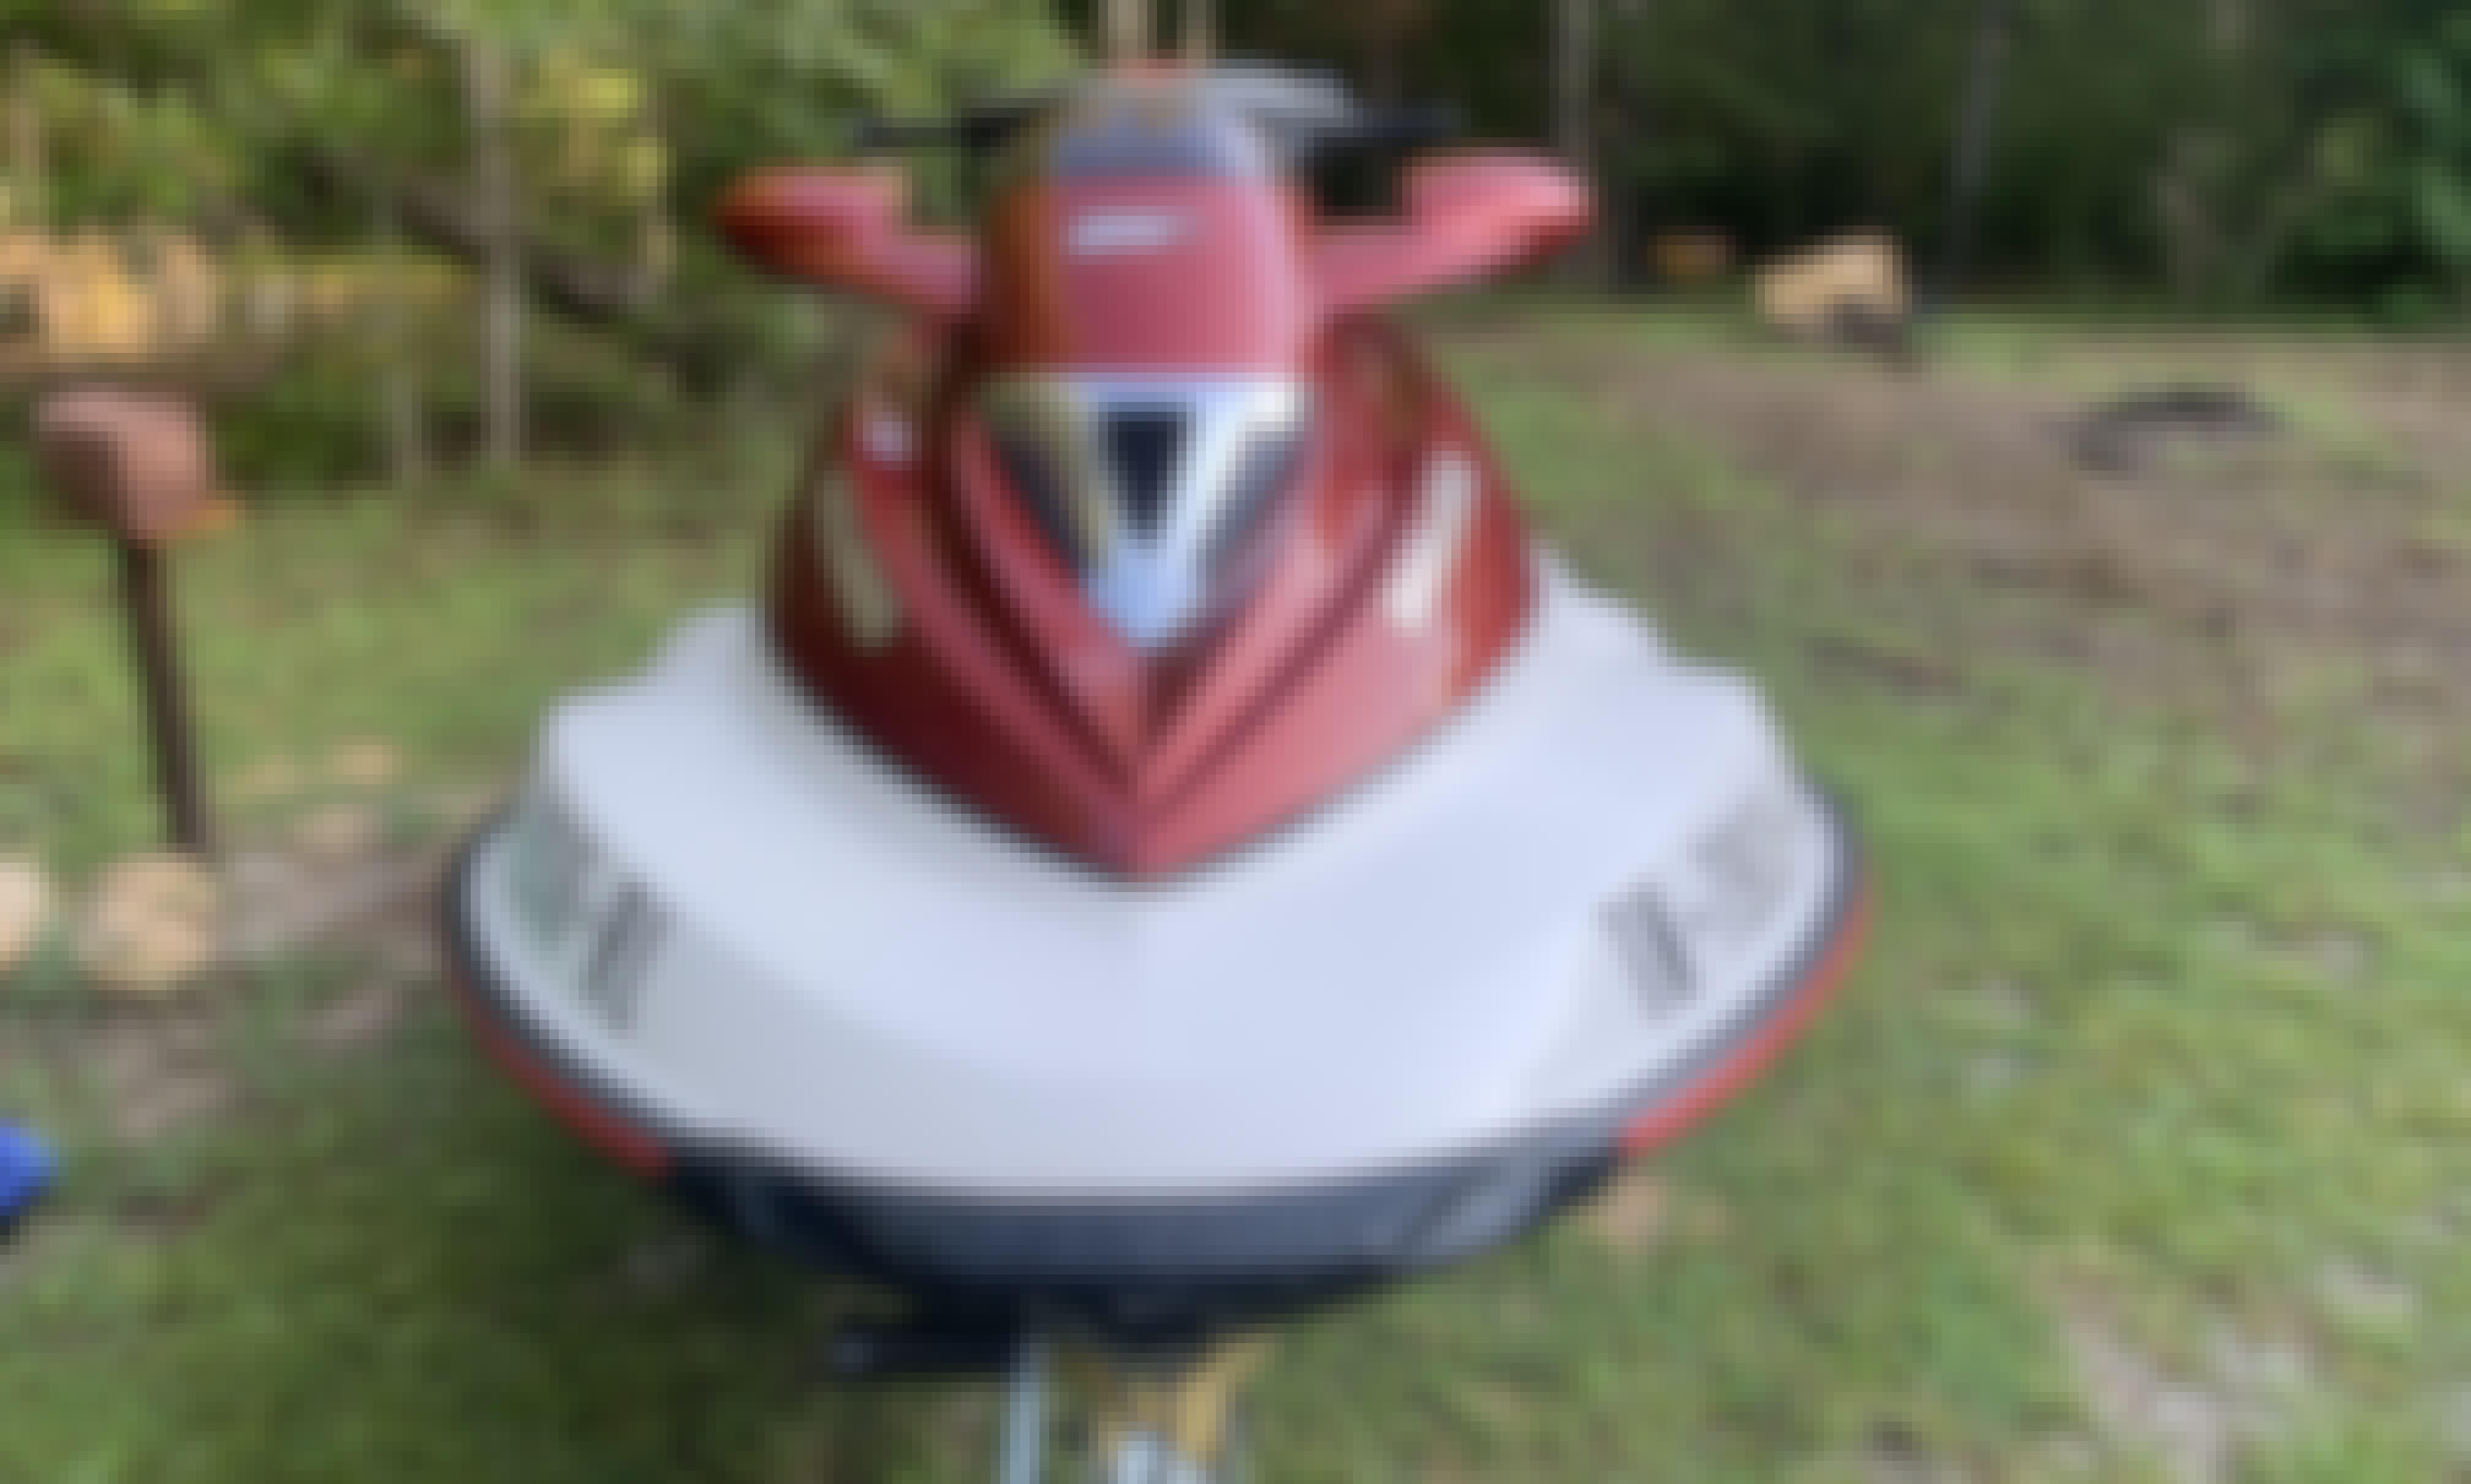 Hire this 3 Seater Fun Sea Doo Jet Ski in Tullahoma, Tennessee